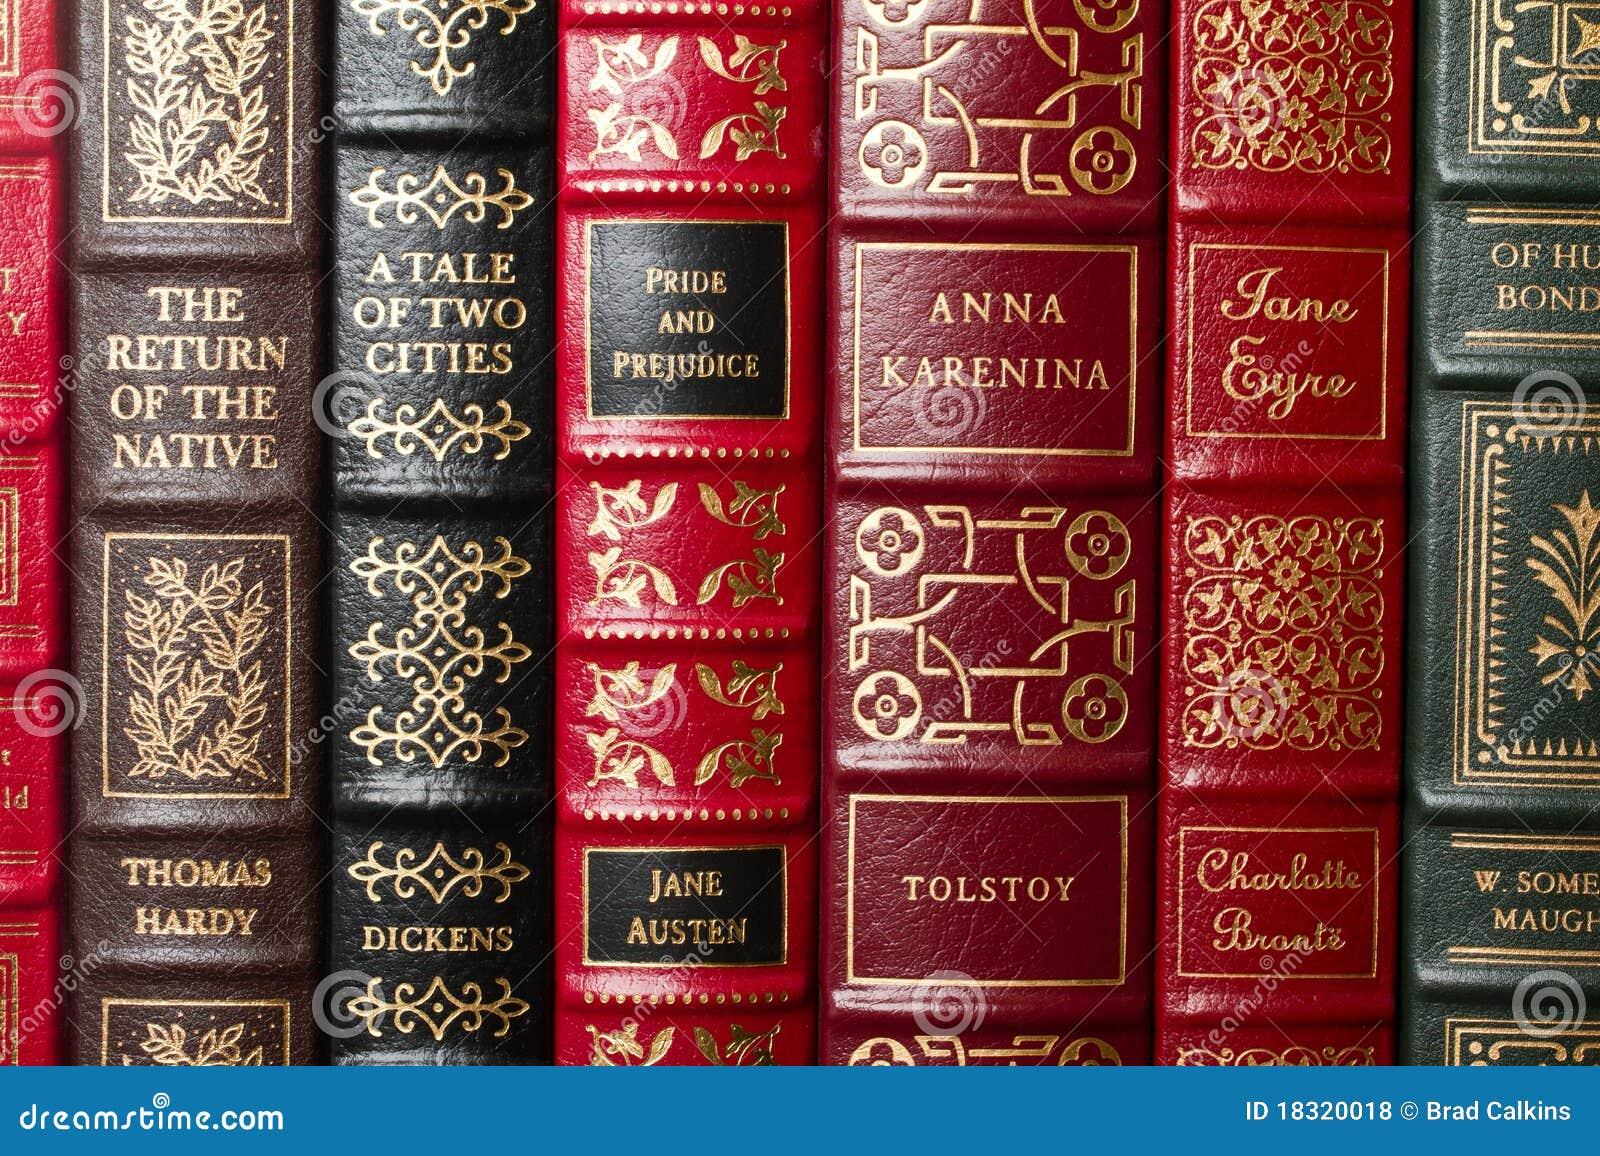 Citaten Uit Klassieke Oudheid : Schrijvers uit de klassieke oudheid van literatuur